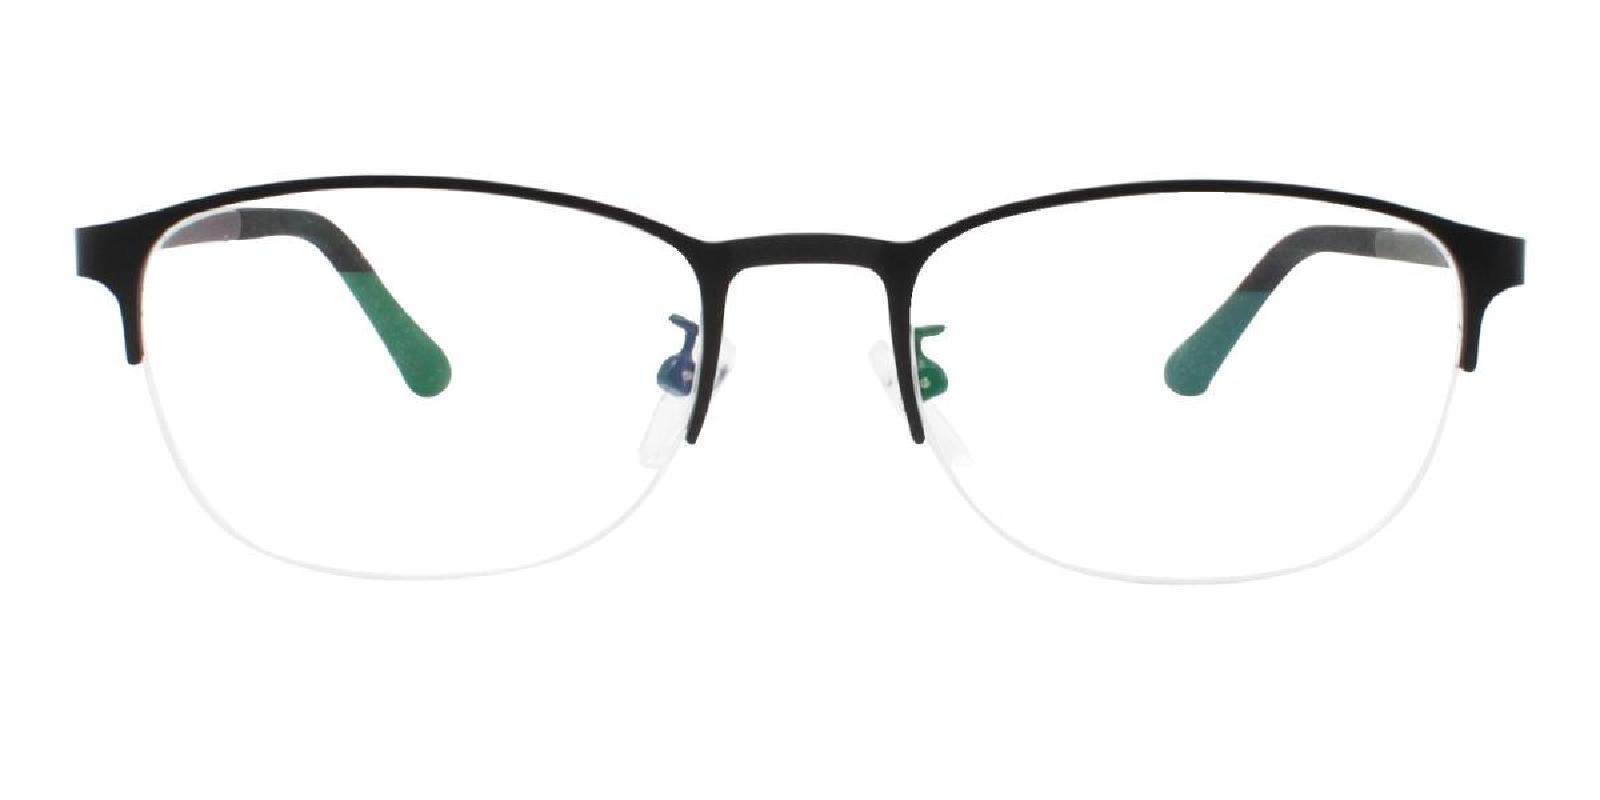 Cora-Black-Rectangle-Metal-Eyeglasses-additional2